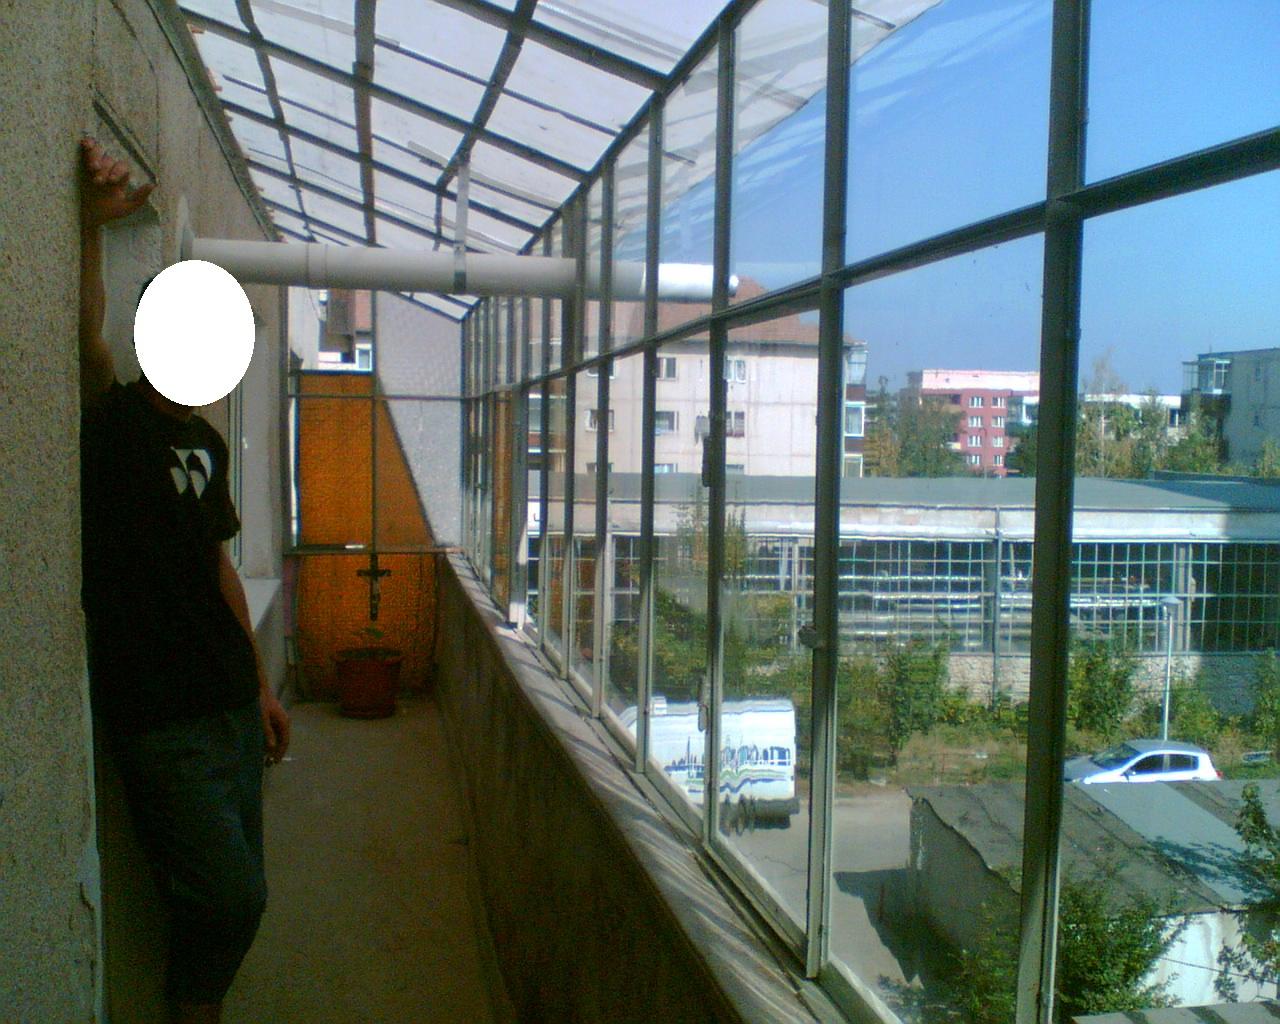 De vanzare apartament cu 3 camere in Cluj-Napoca FOTO